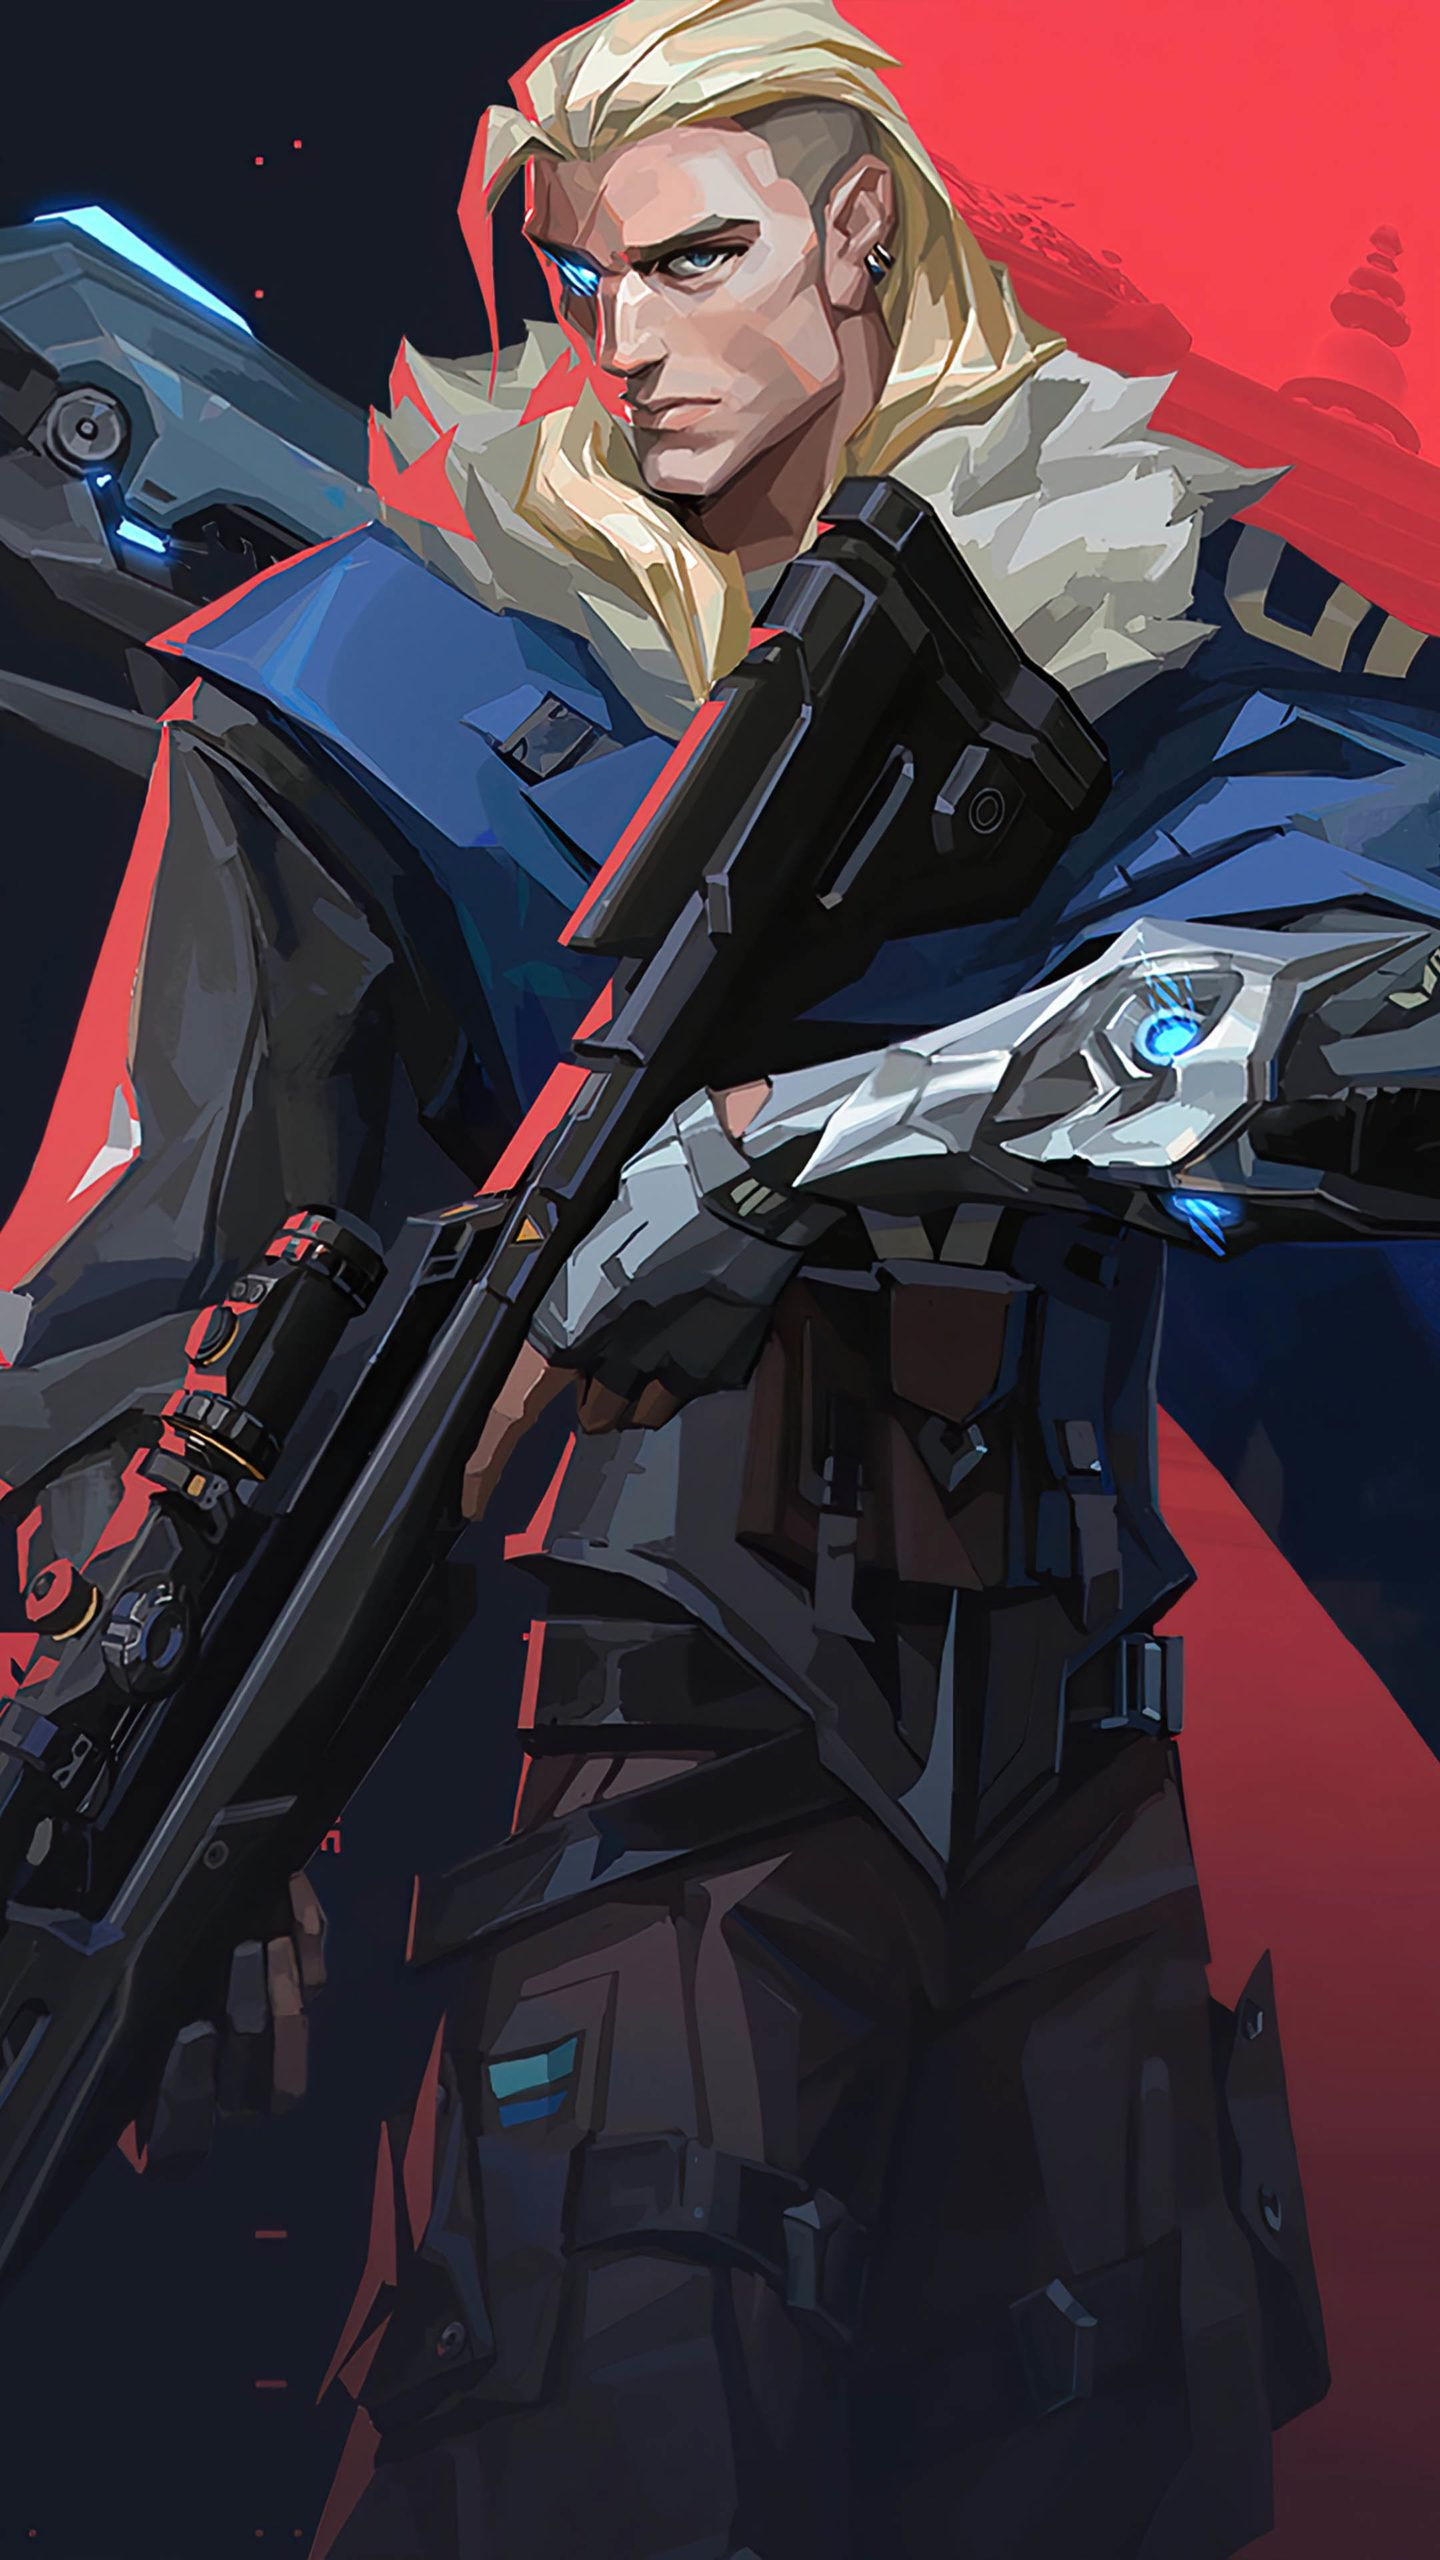 Sova Valorant 4k Ultra Hd Mobile Wallpaper In 2020 Overwatch Hero Concepts Game Concept Art Wreath Illustration Vector